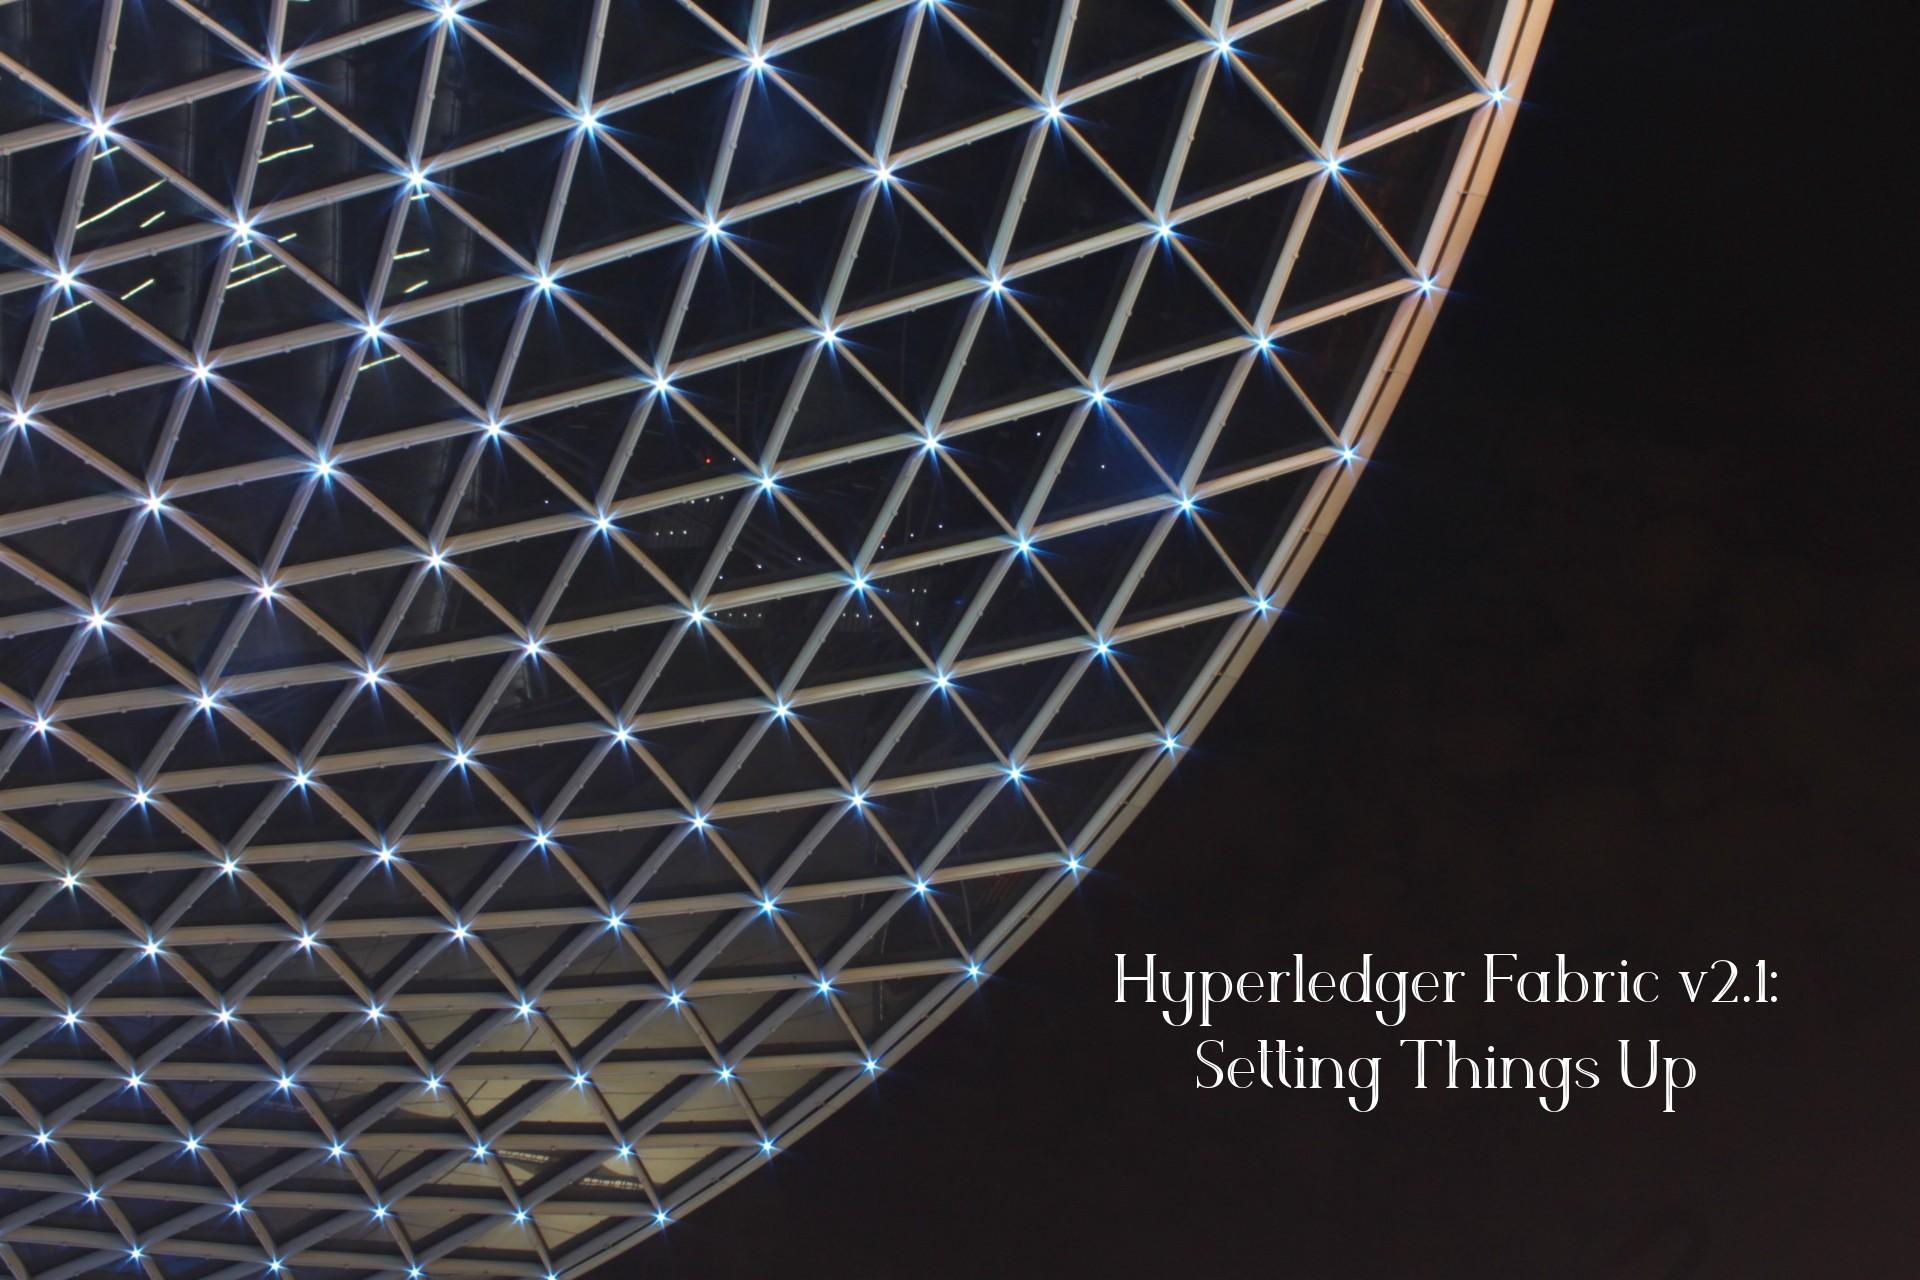 Hyperledger Fabric v2.1: Setting Things Up